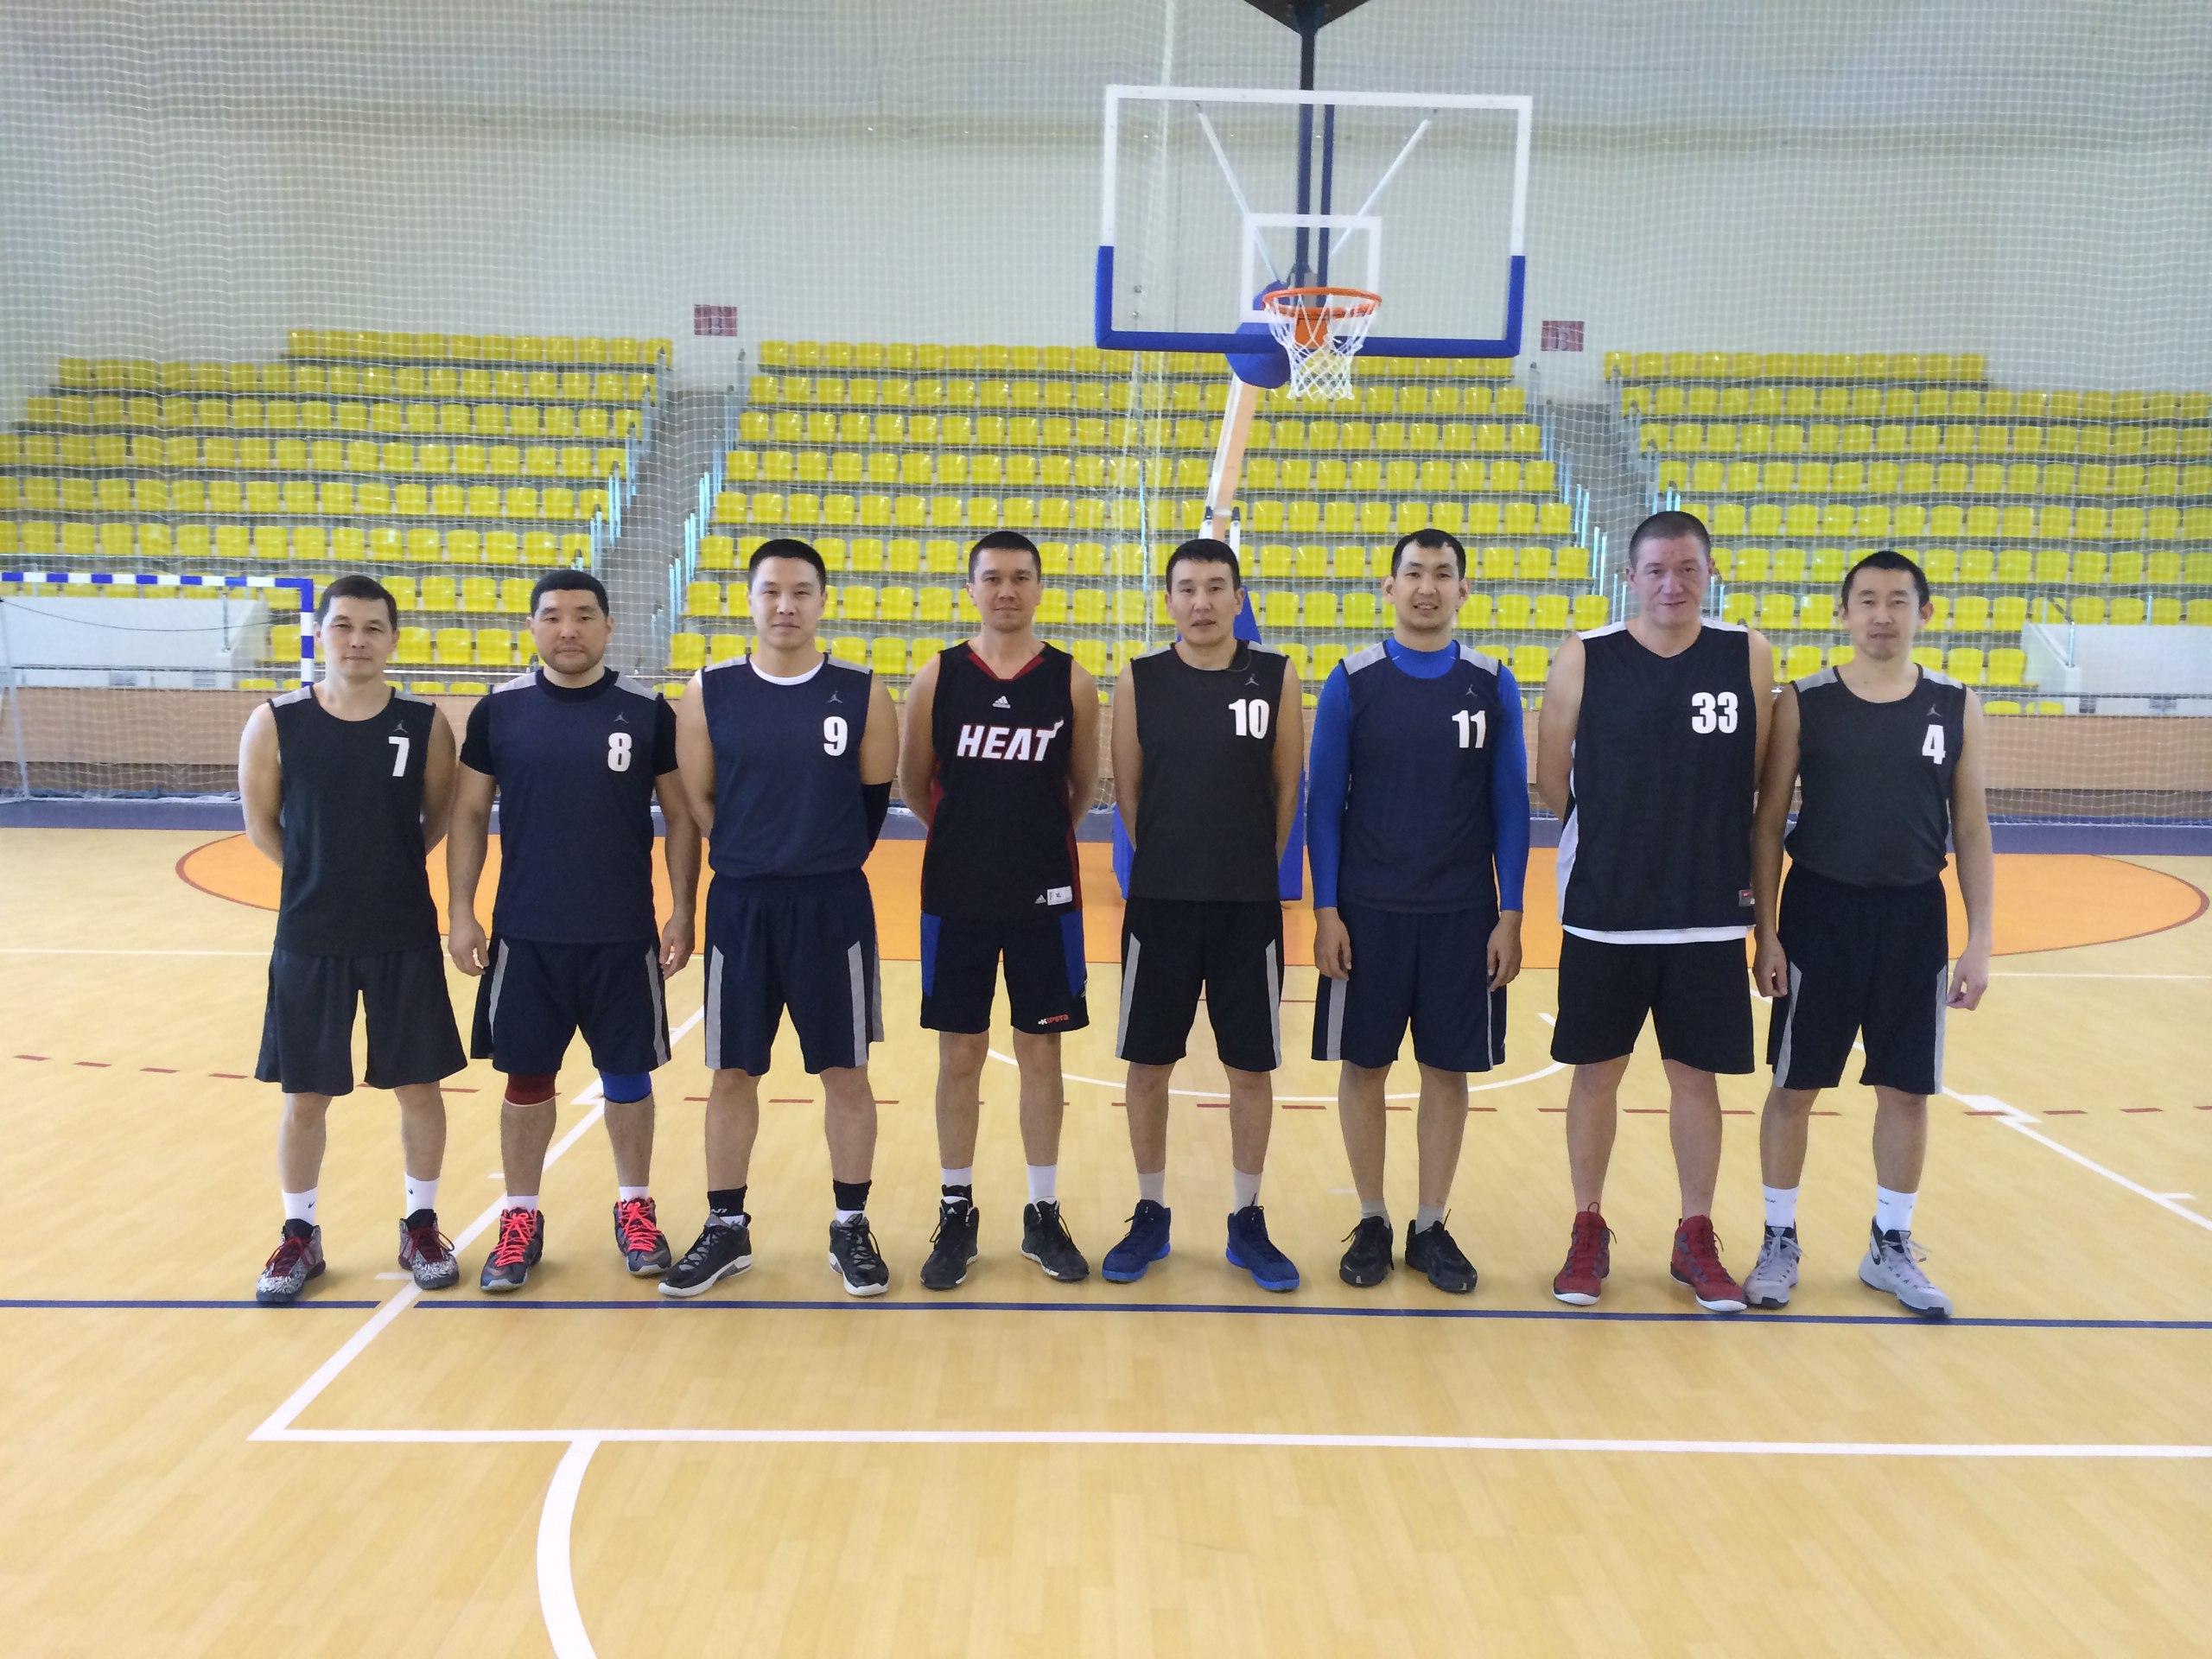 Элиста Республика Калмыкия баскетбол